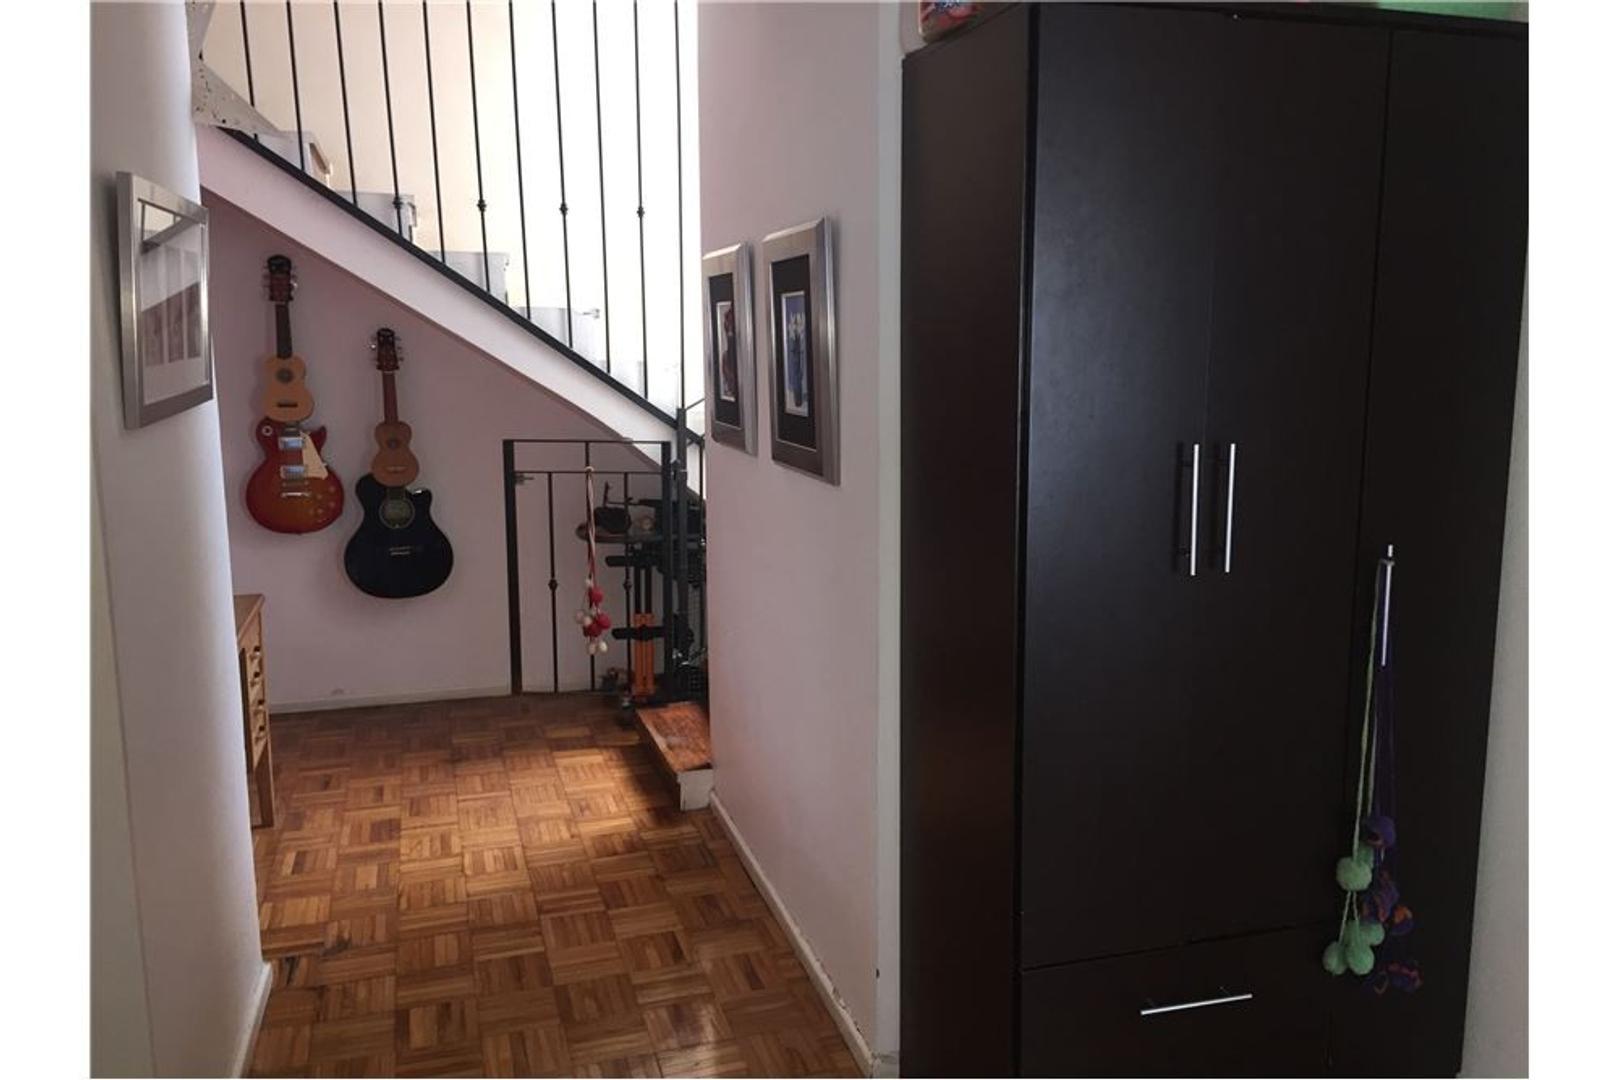 Excelente propiedad con balcón terraza de de 25mts